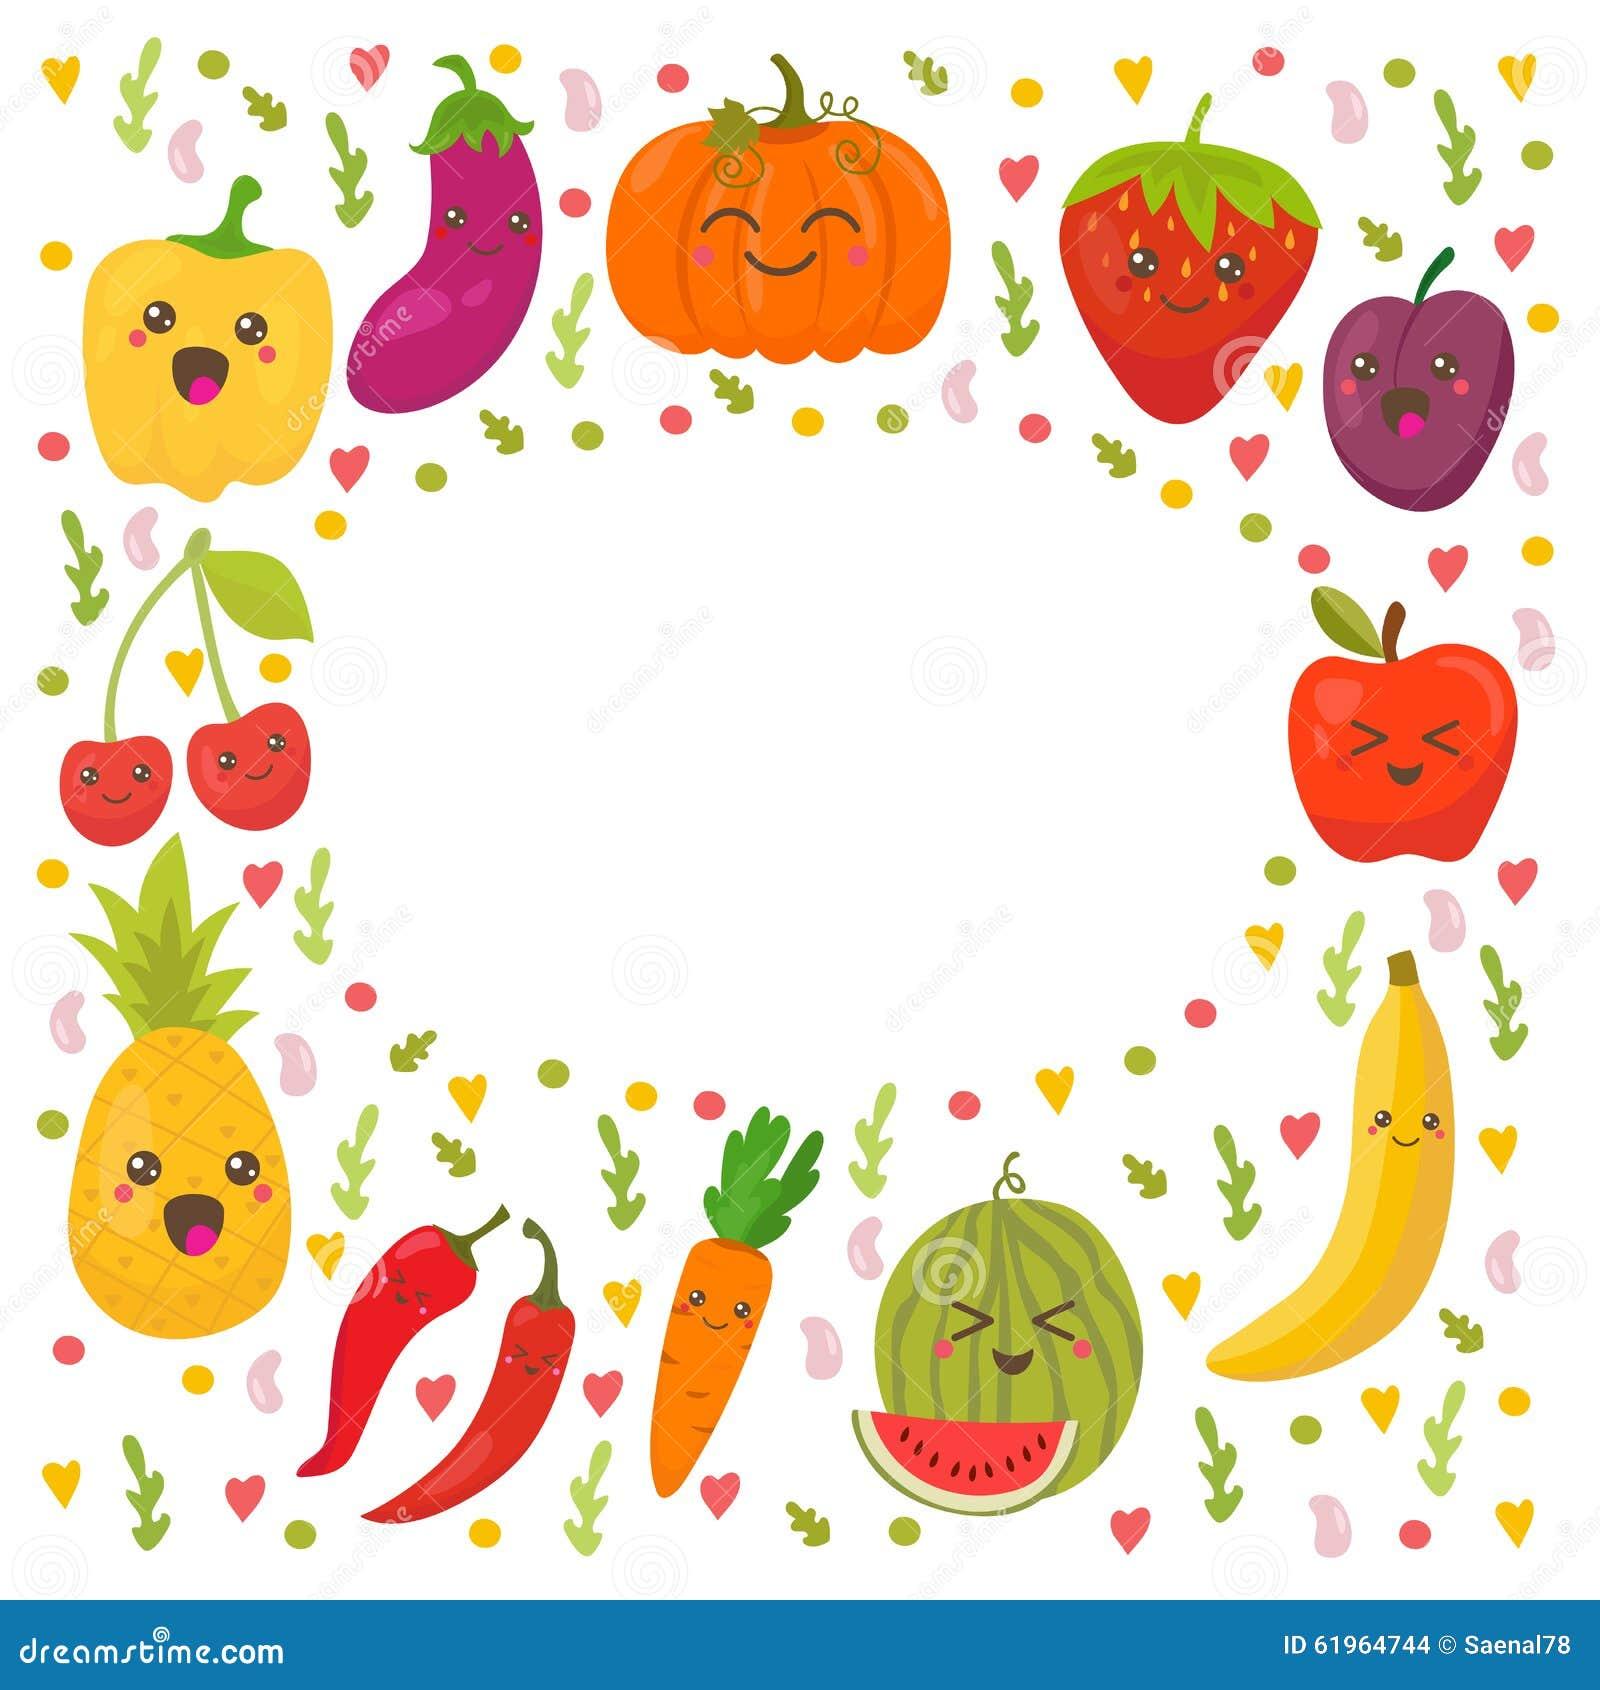 Edible Paradise A Coloring Book of Seasonal Fruits and